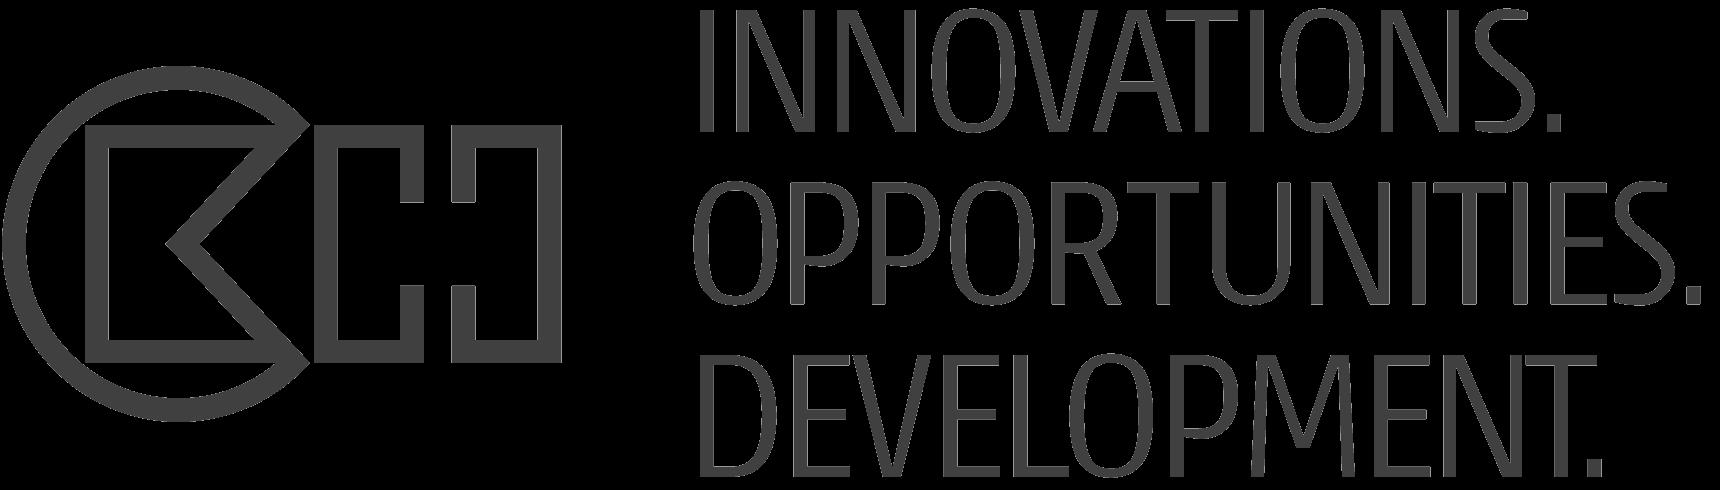 CKH Innovations Opportunities Development